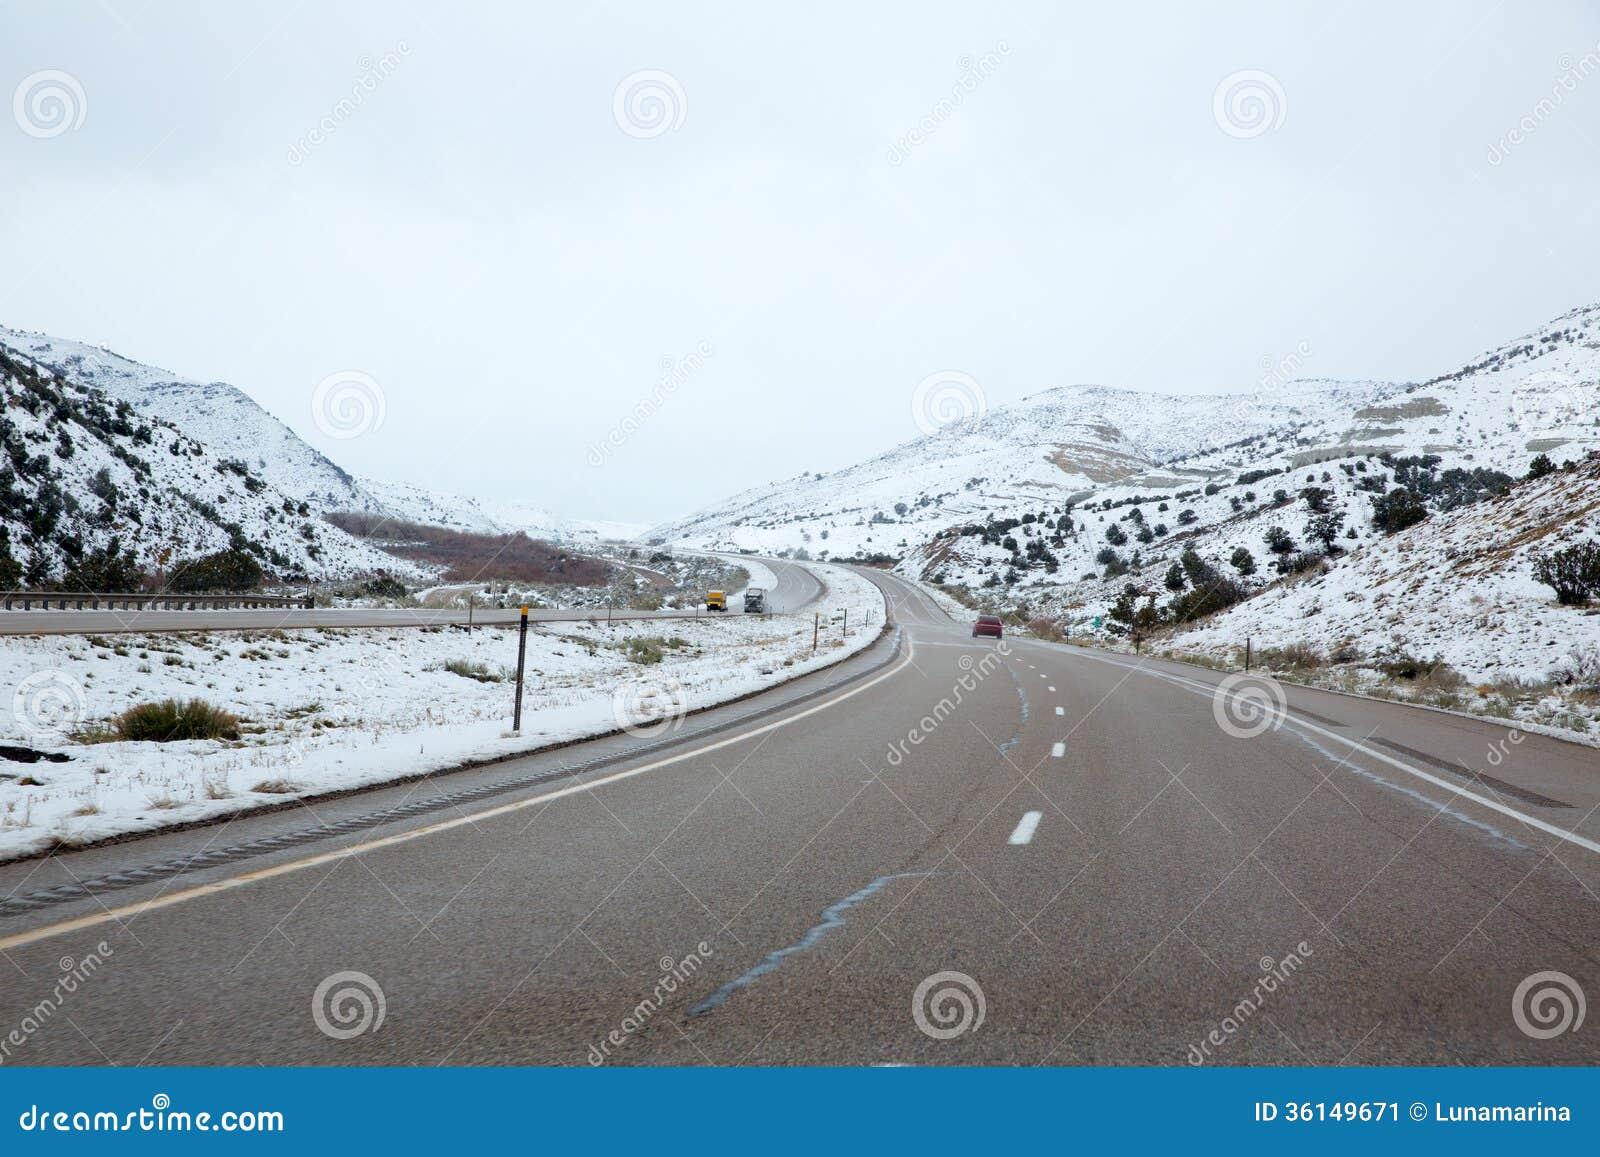 roads usa nevada - photo #37